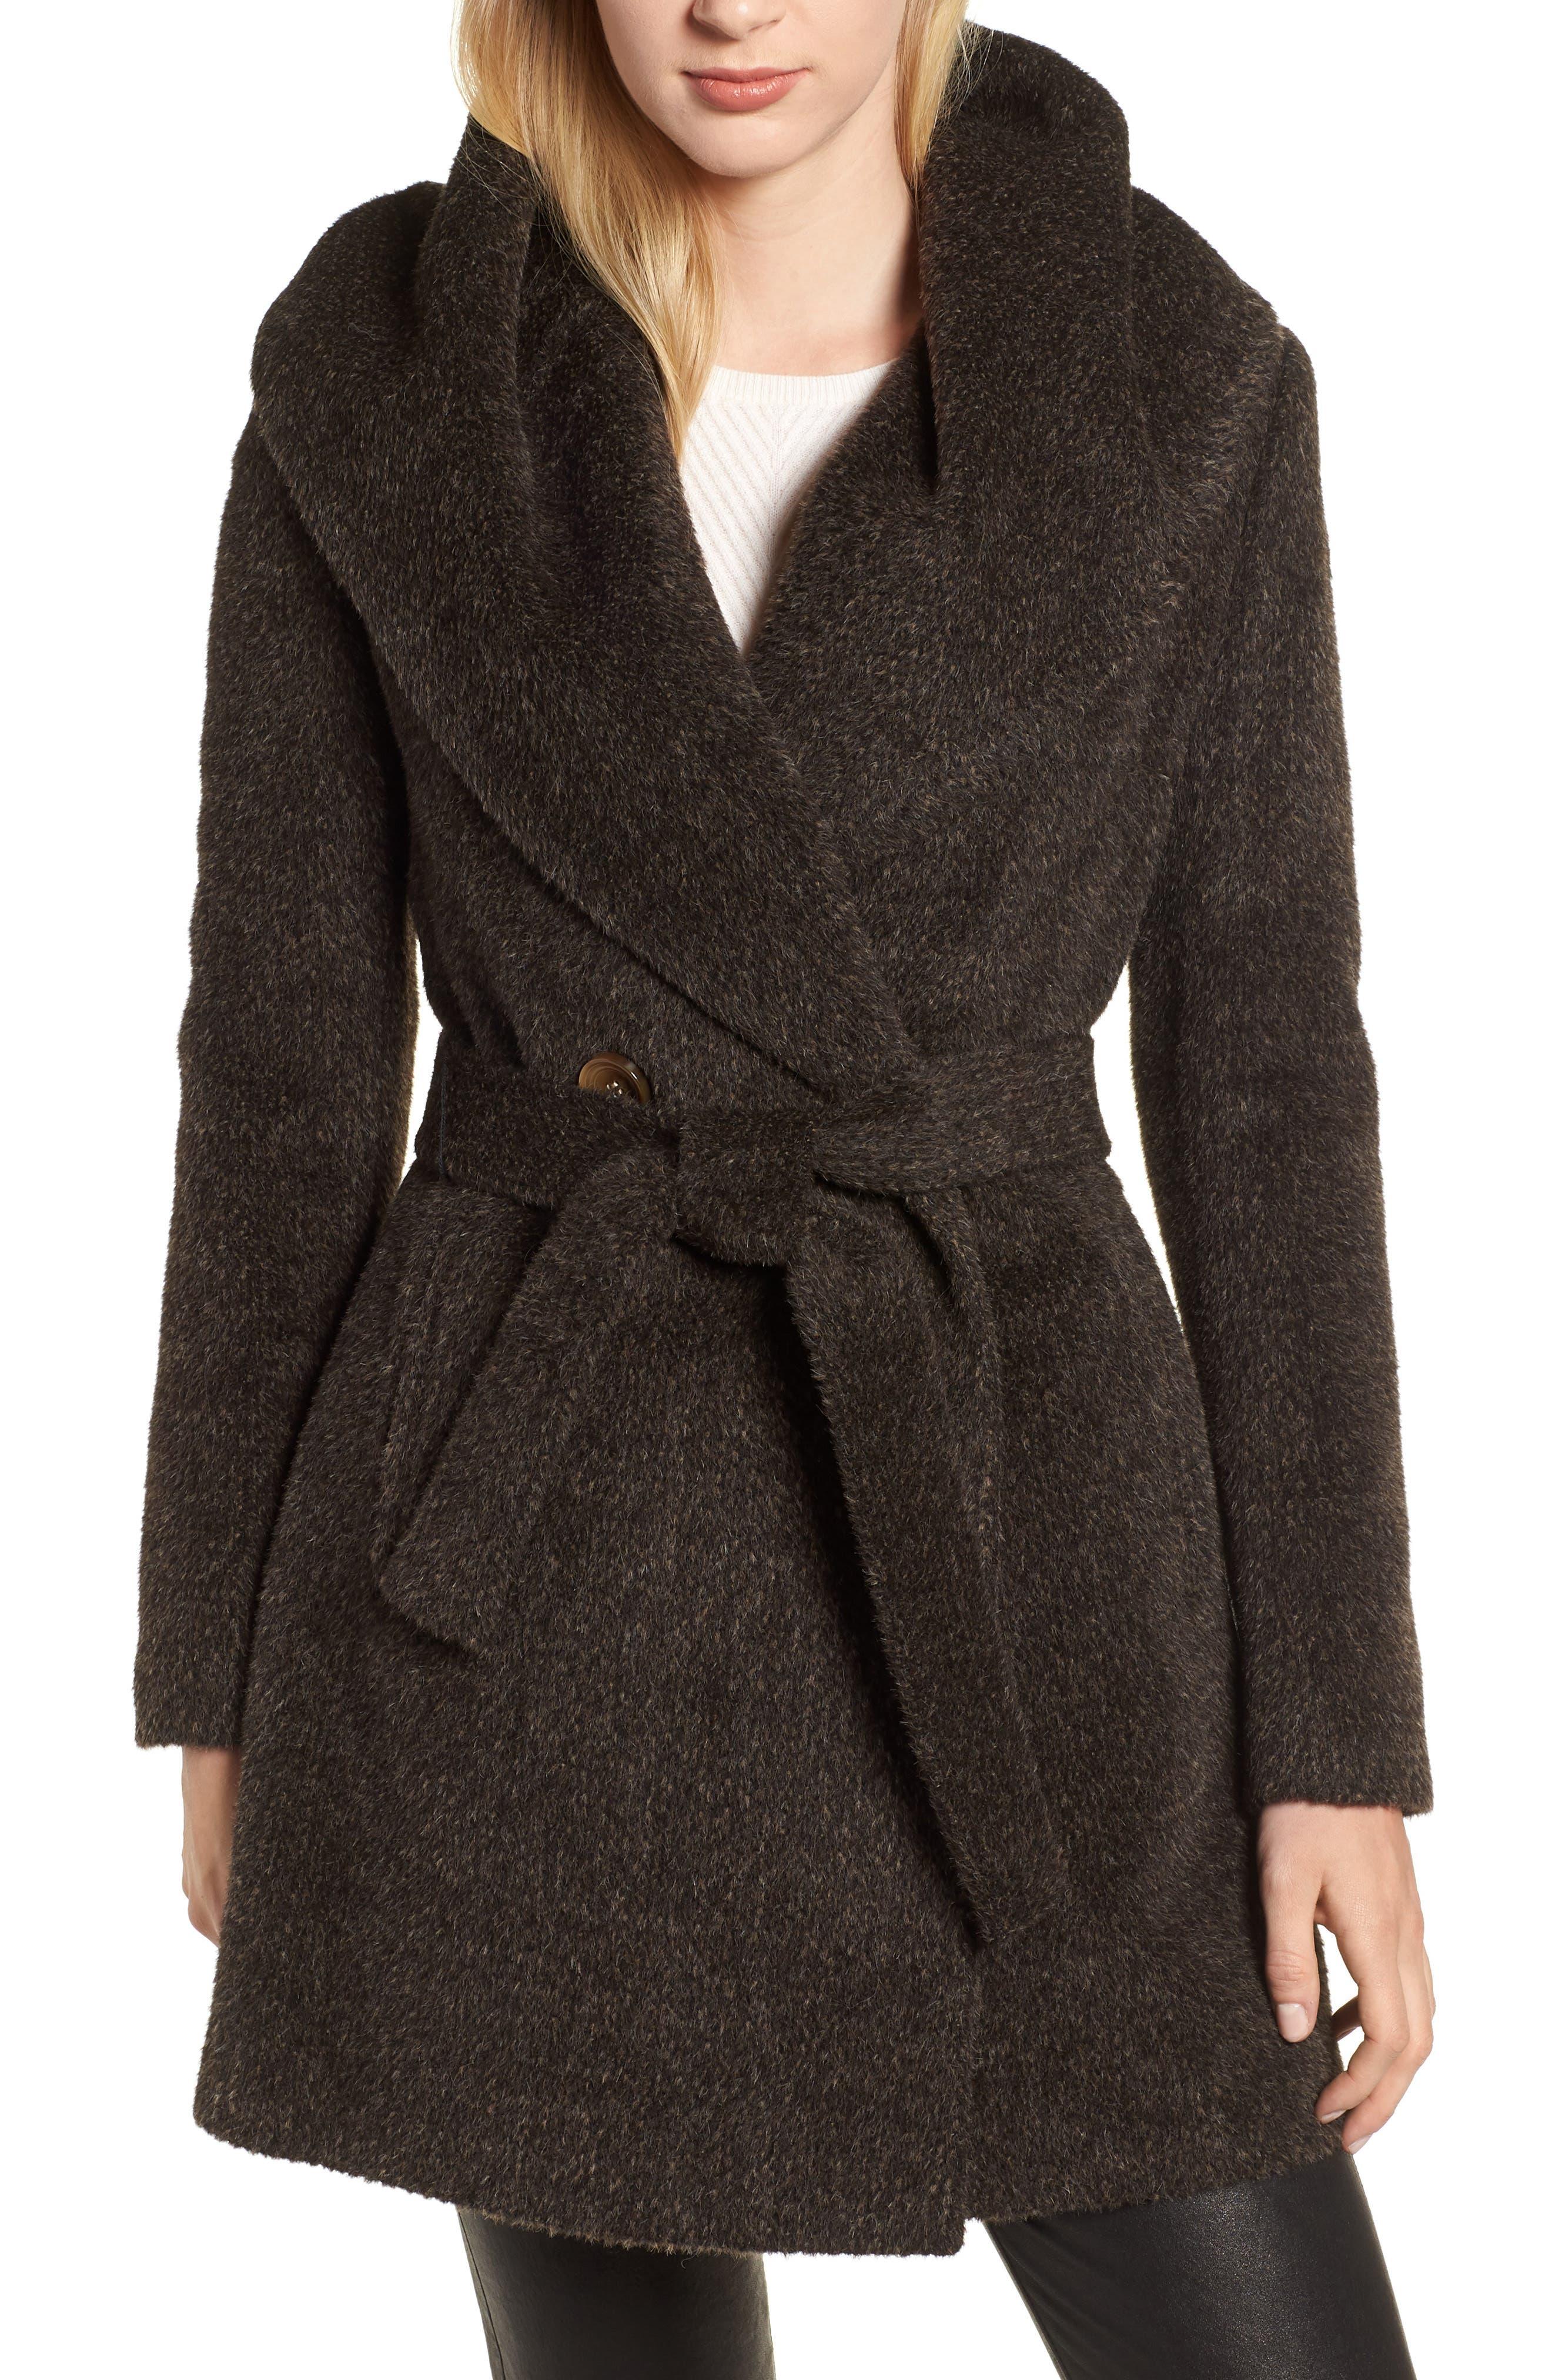 Grace Hooded Wrap Walker Coat,                             Main thumbnail 1, color,                             BROWN/ BLACK